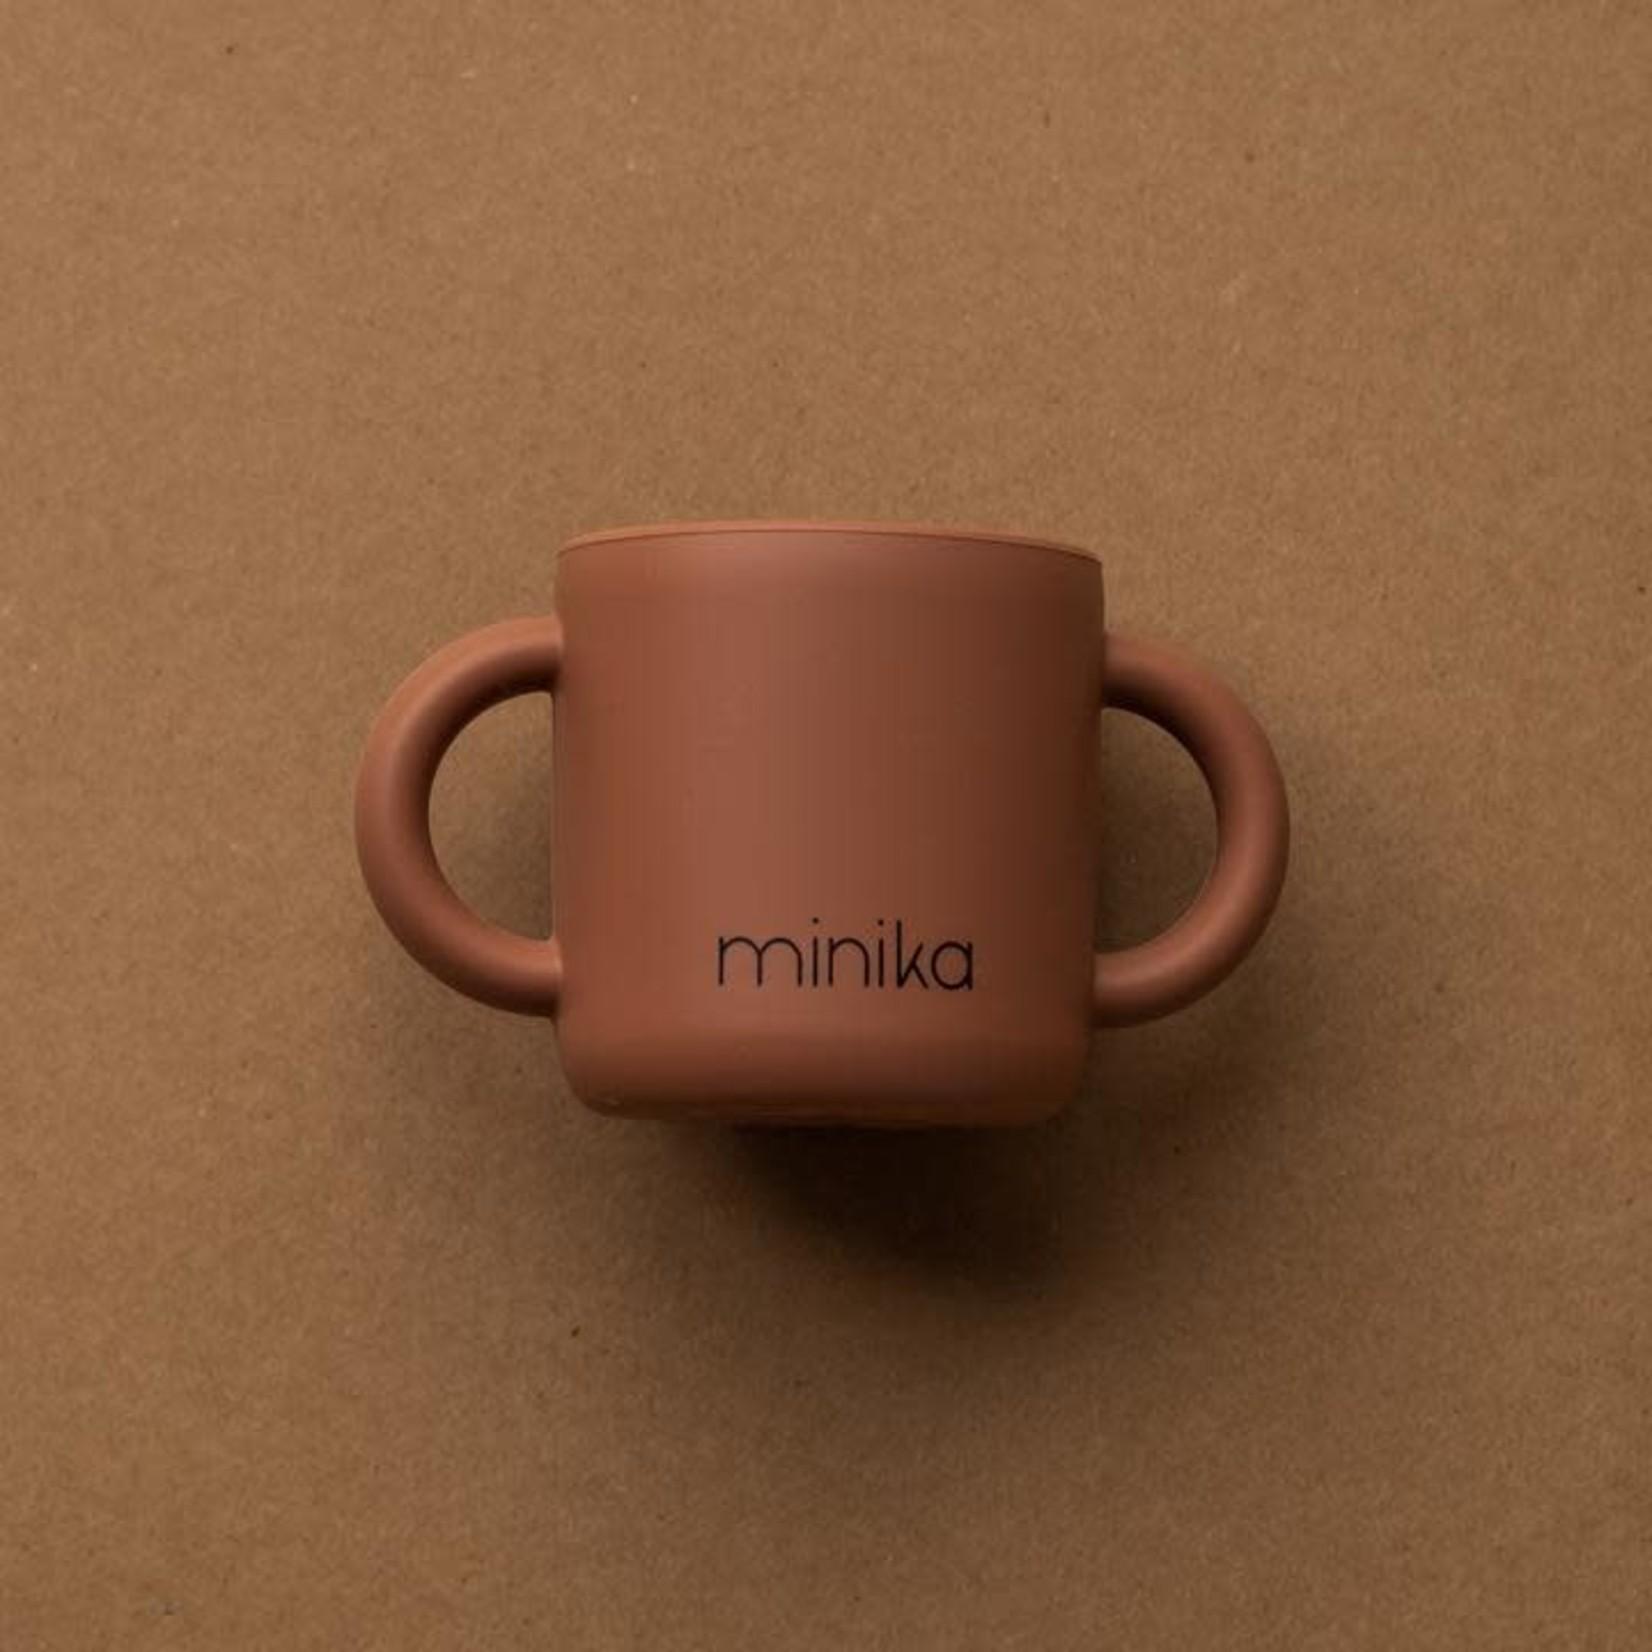 Minika Minika verre d'apprentissage cacao